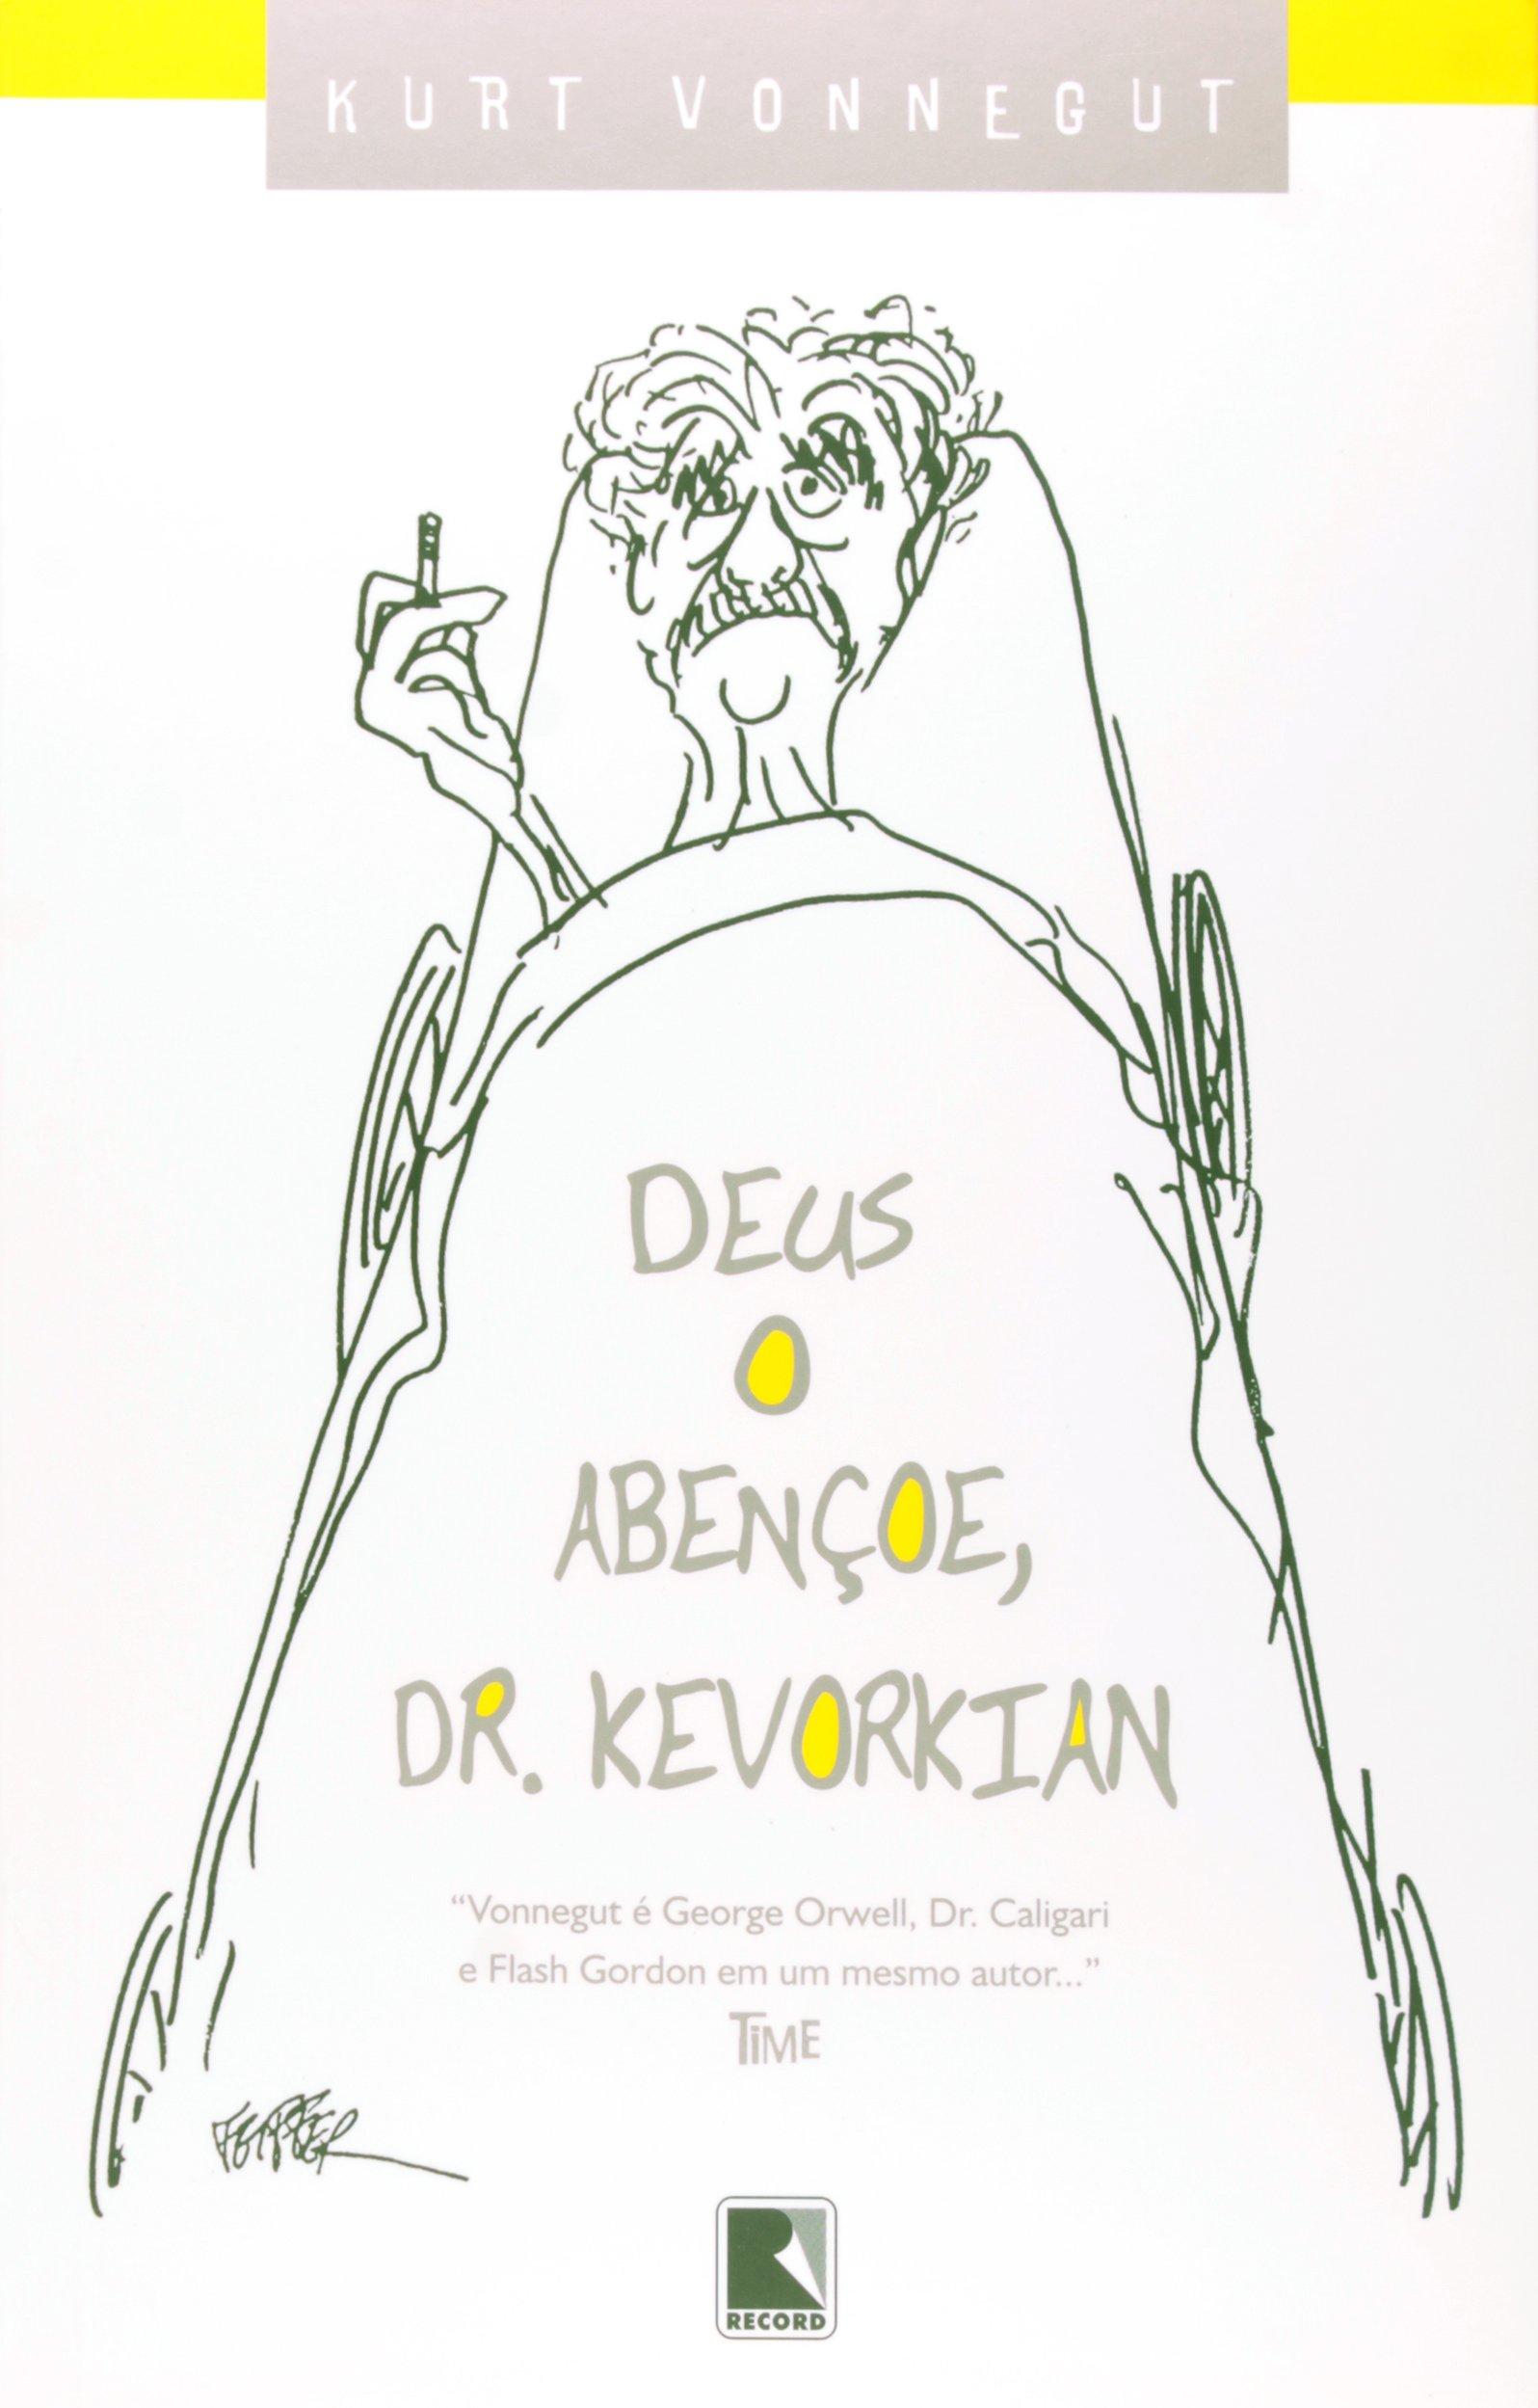 Deus o Abençoe, Dr. Kevorkian (Em Portuguese do Brasil): Kurt Vonnegut: 9788501077998: Amazon.com: Books